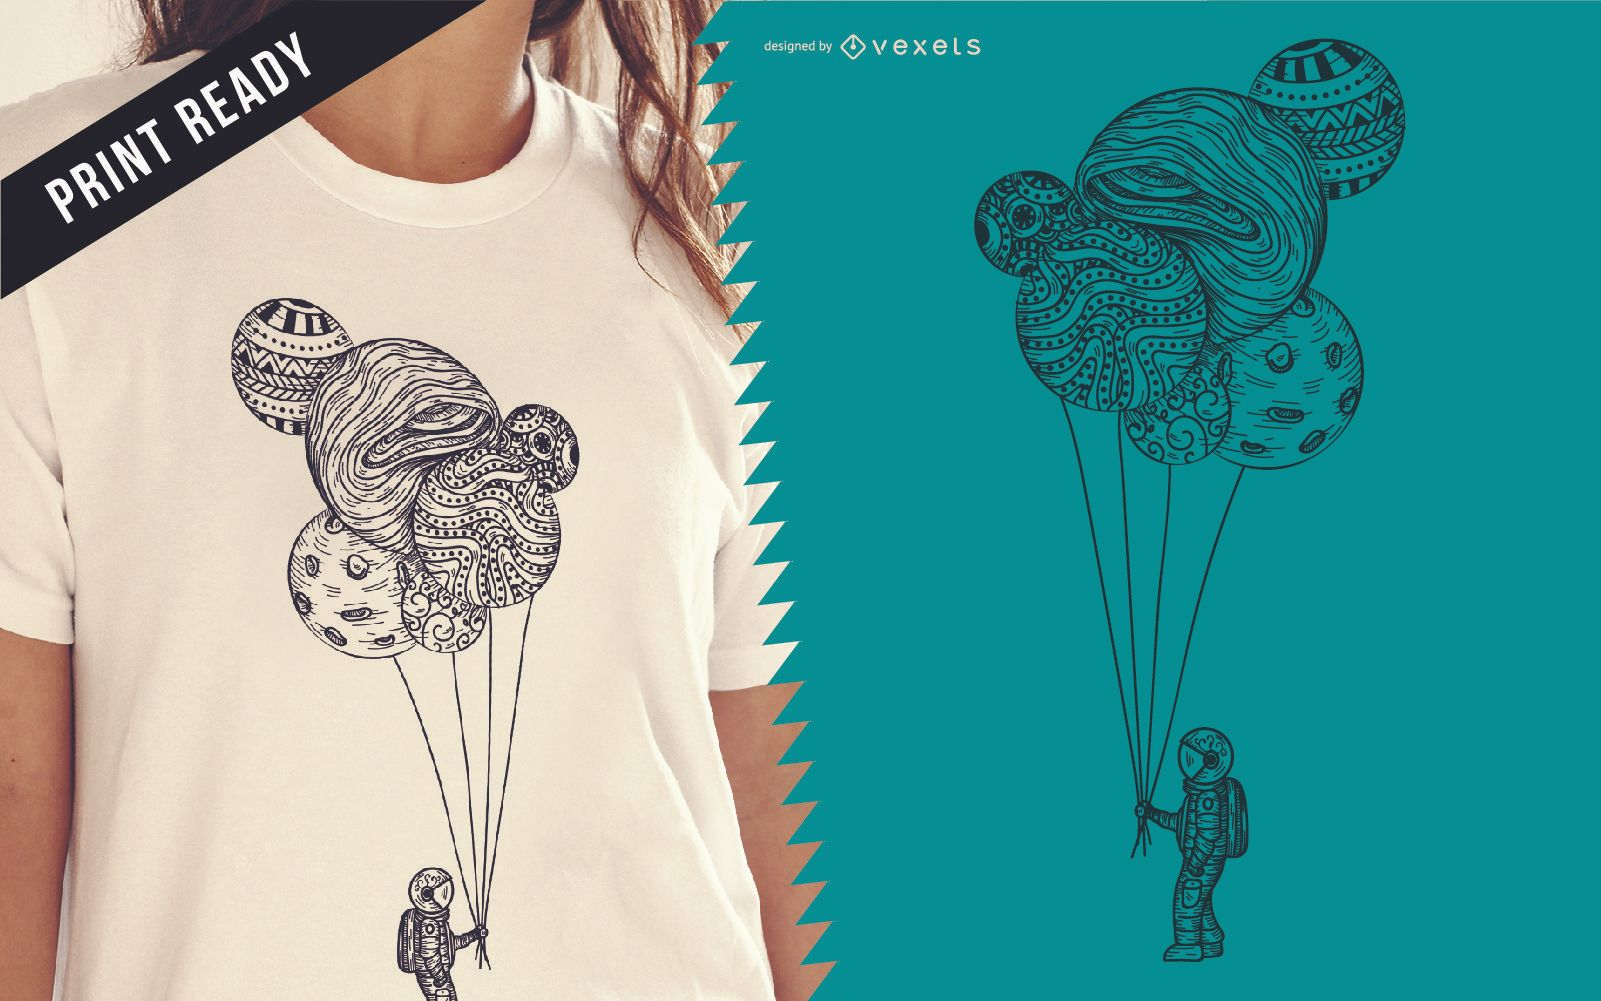 Astronaut illustration t-shirt design